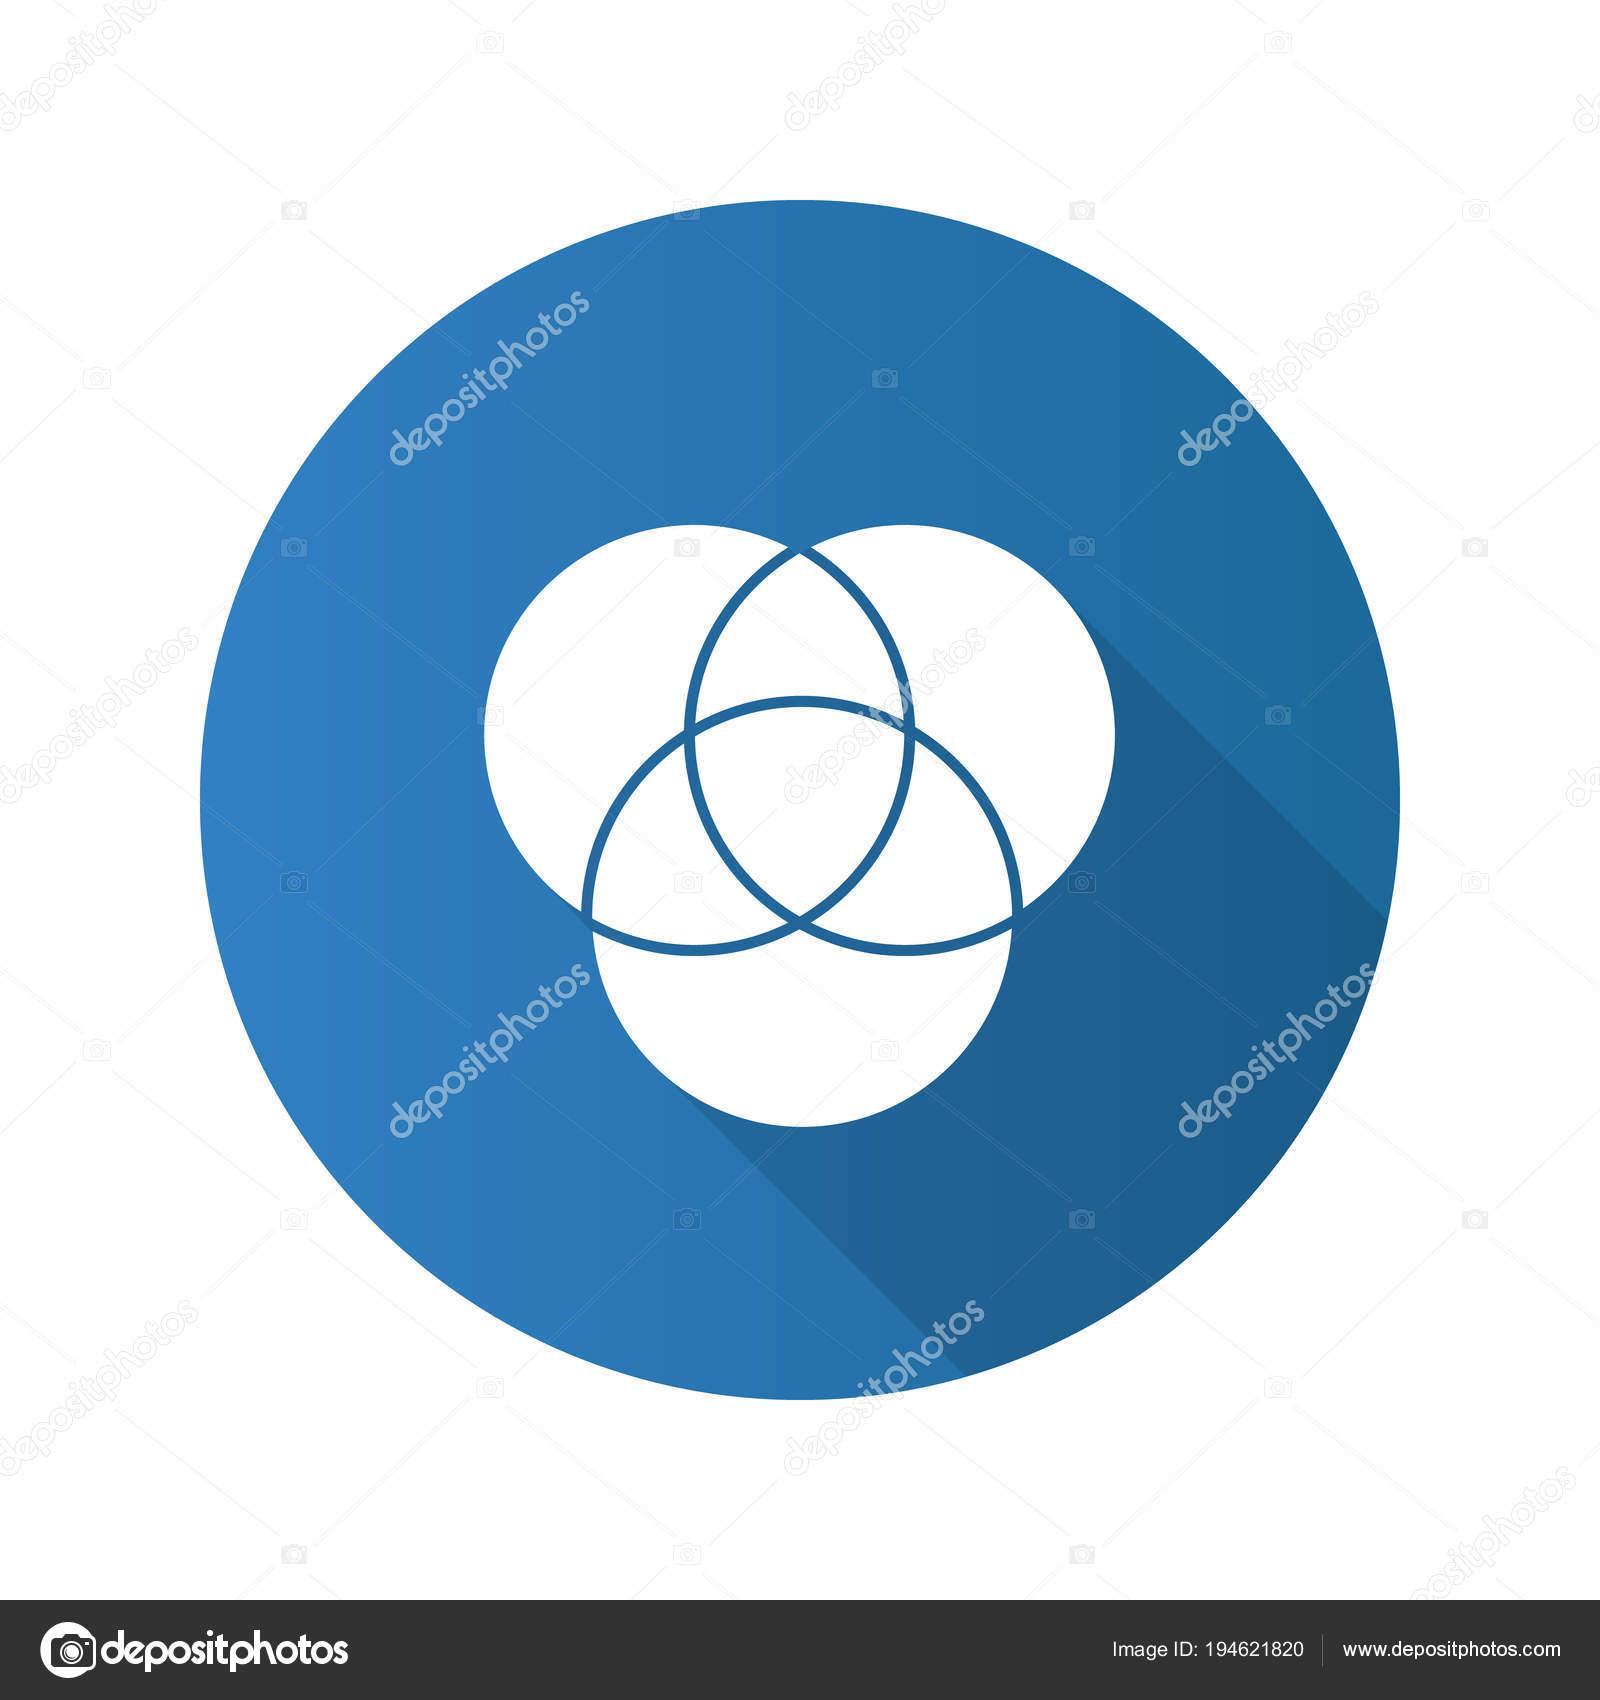 cmyk rgb color circles flat design long shadow glyph icon stock rh depositphotos com Vector Golf Club Silhouette Vector Golf Balls